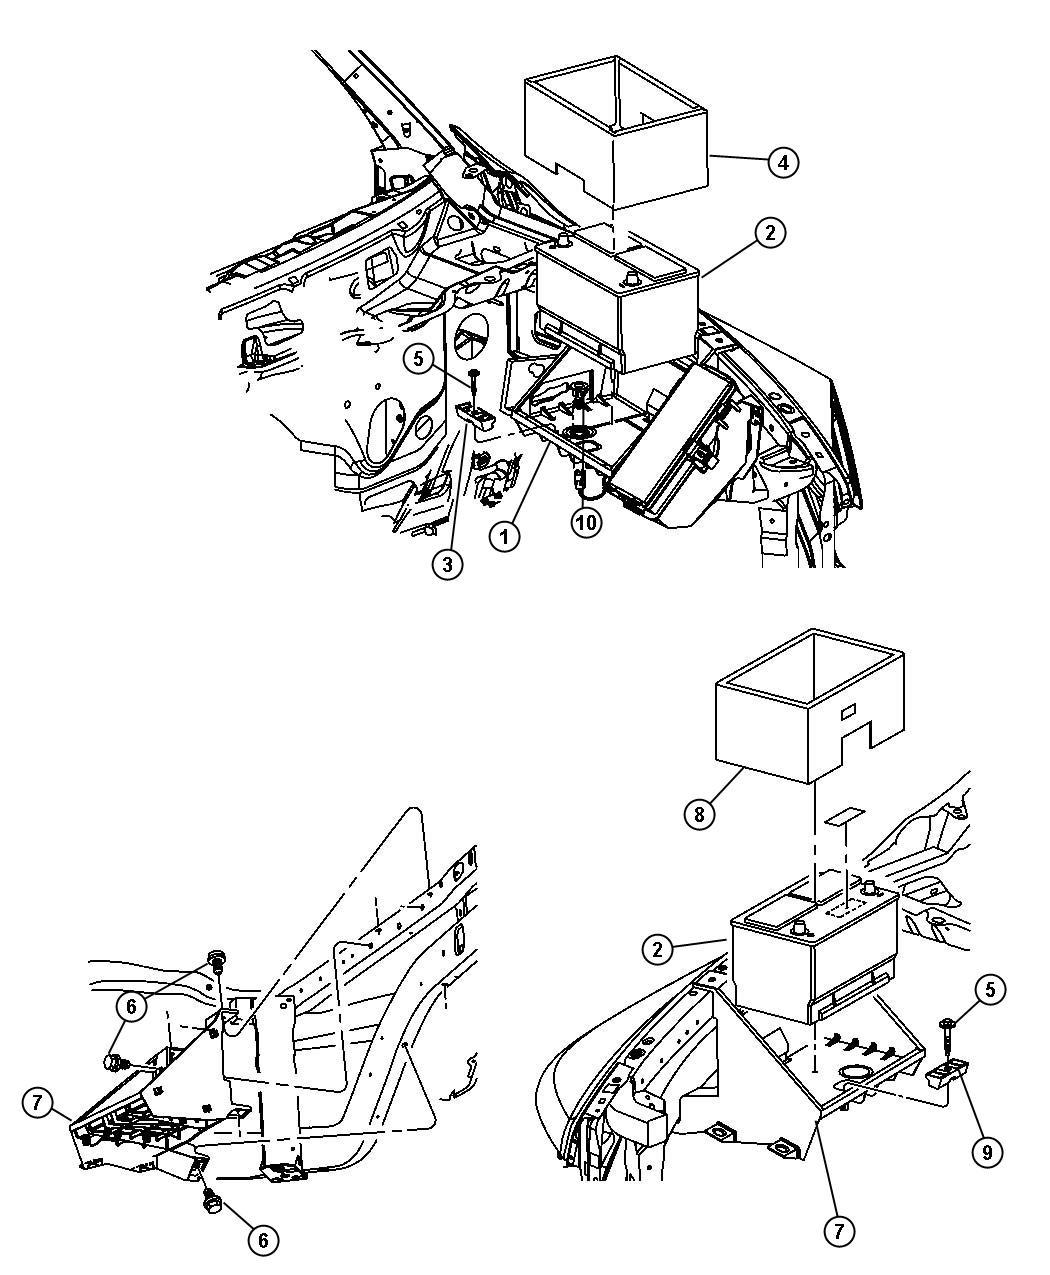 Dodge Ram Crew Cab Chassis 6 7l Cummins Turbosel 6 Speed Manual G56 Battery Tray